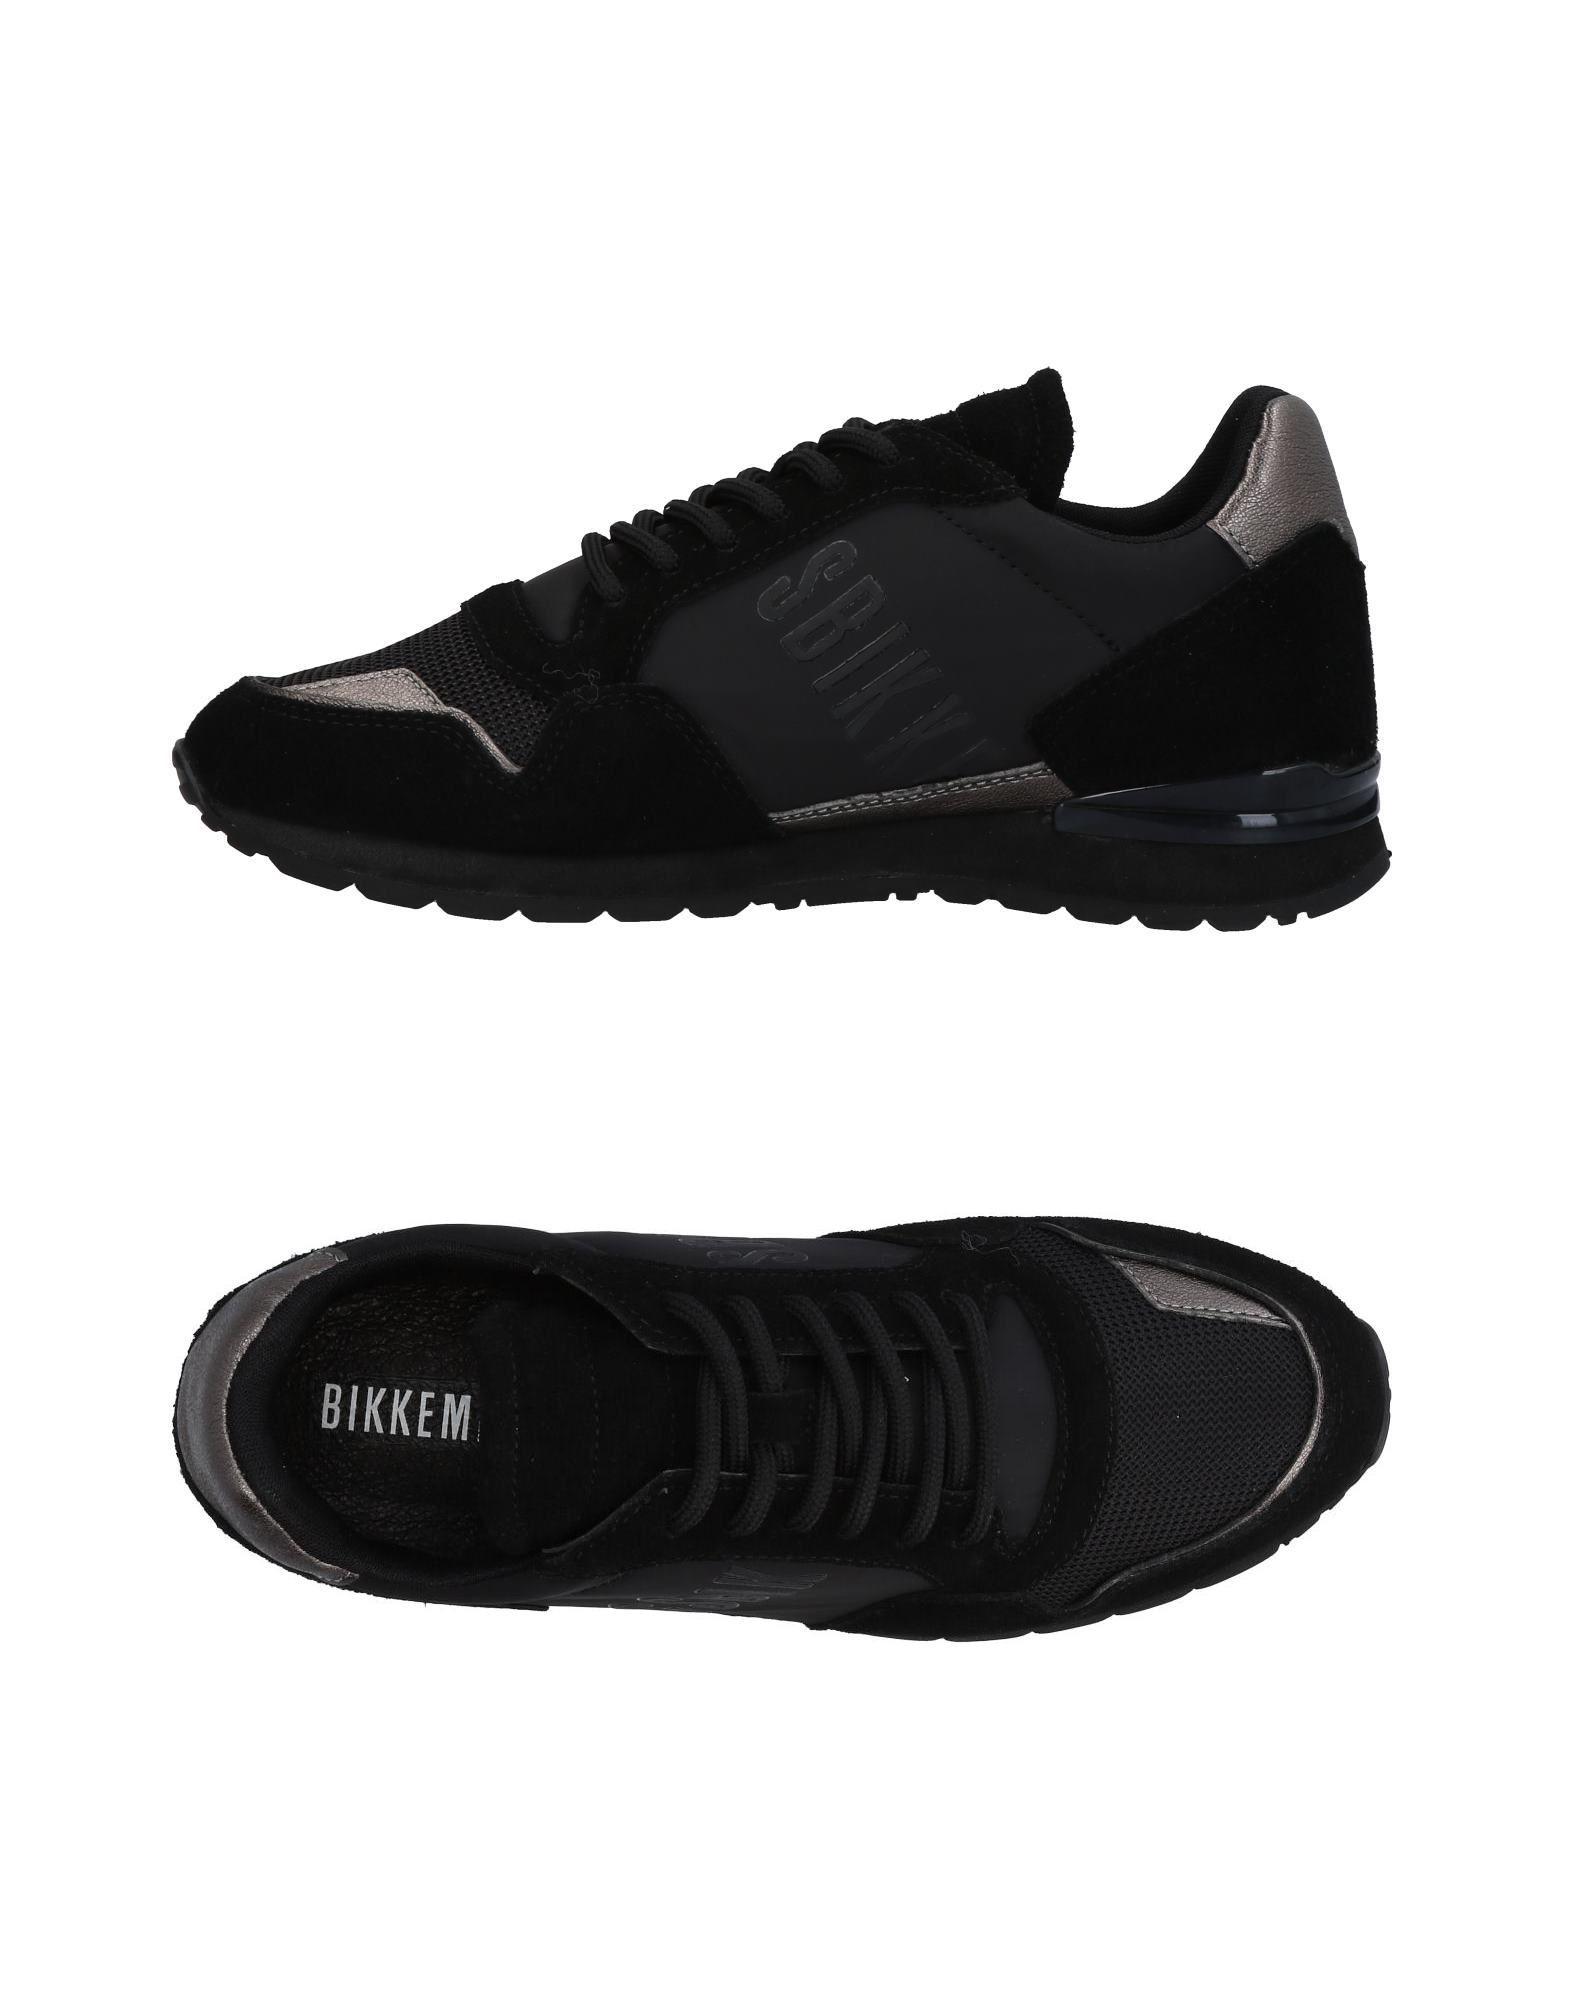 Moda Sneakers Bikkembergs Donna - 11450597BJ 11450597BJ - a8246f